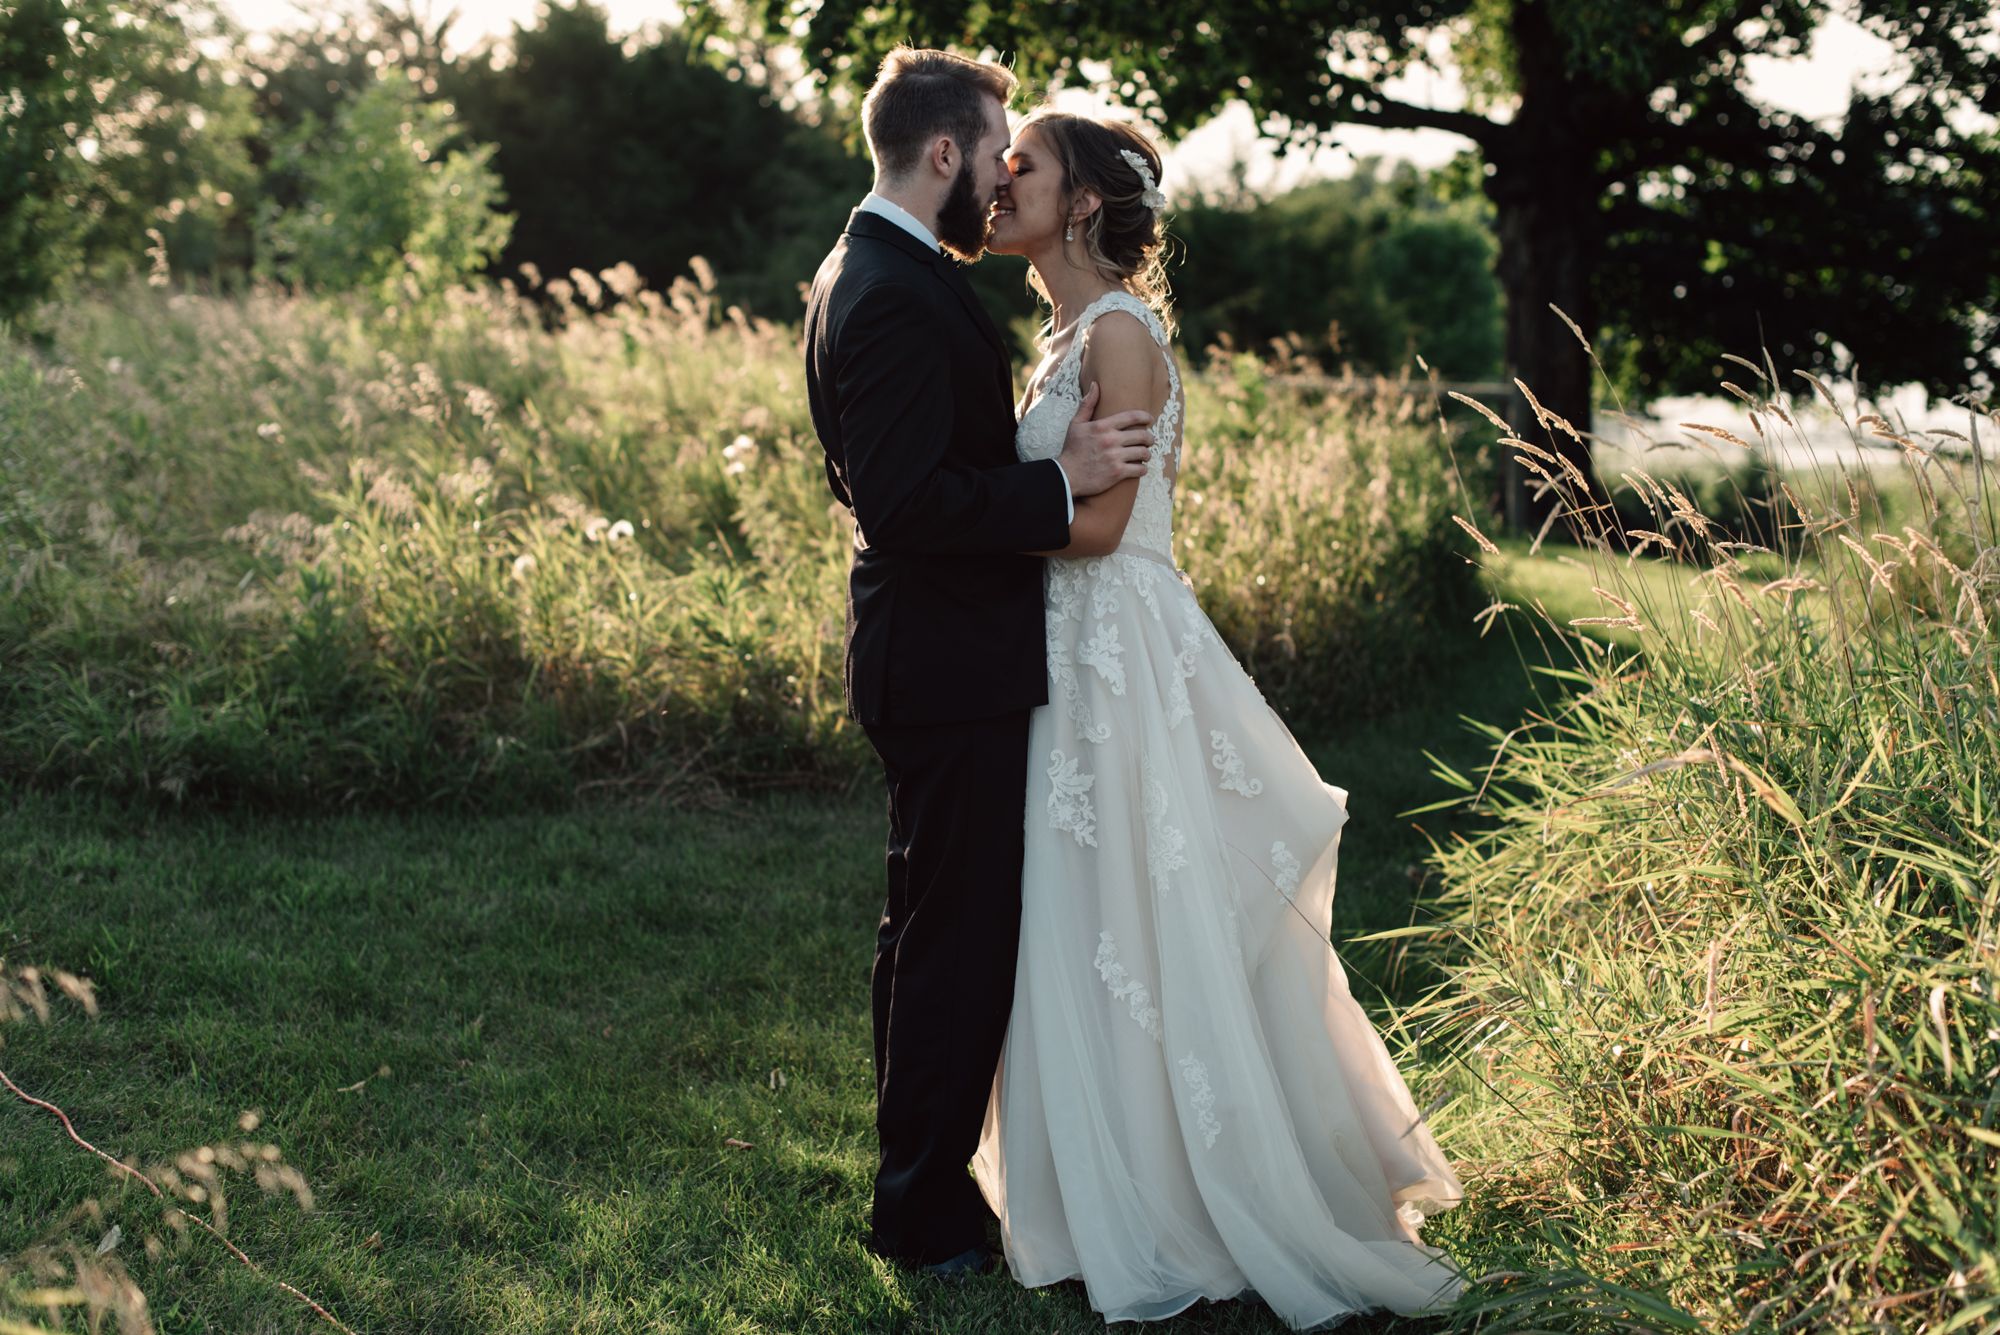 sunset-wedding-photography-1-3.jpg